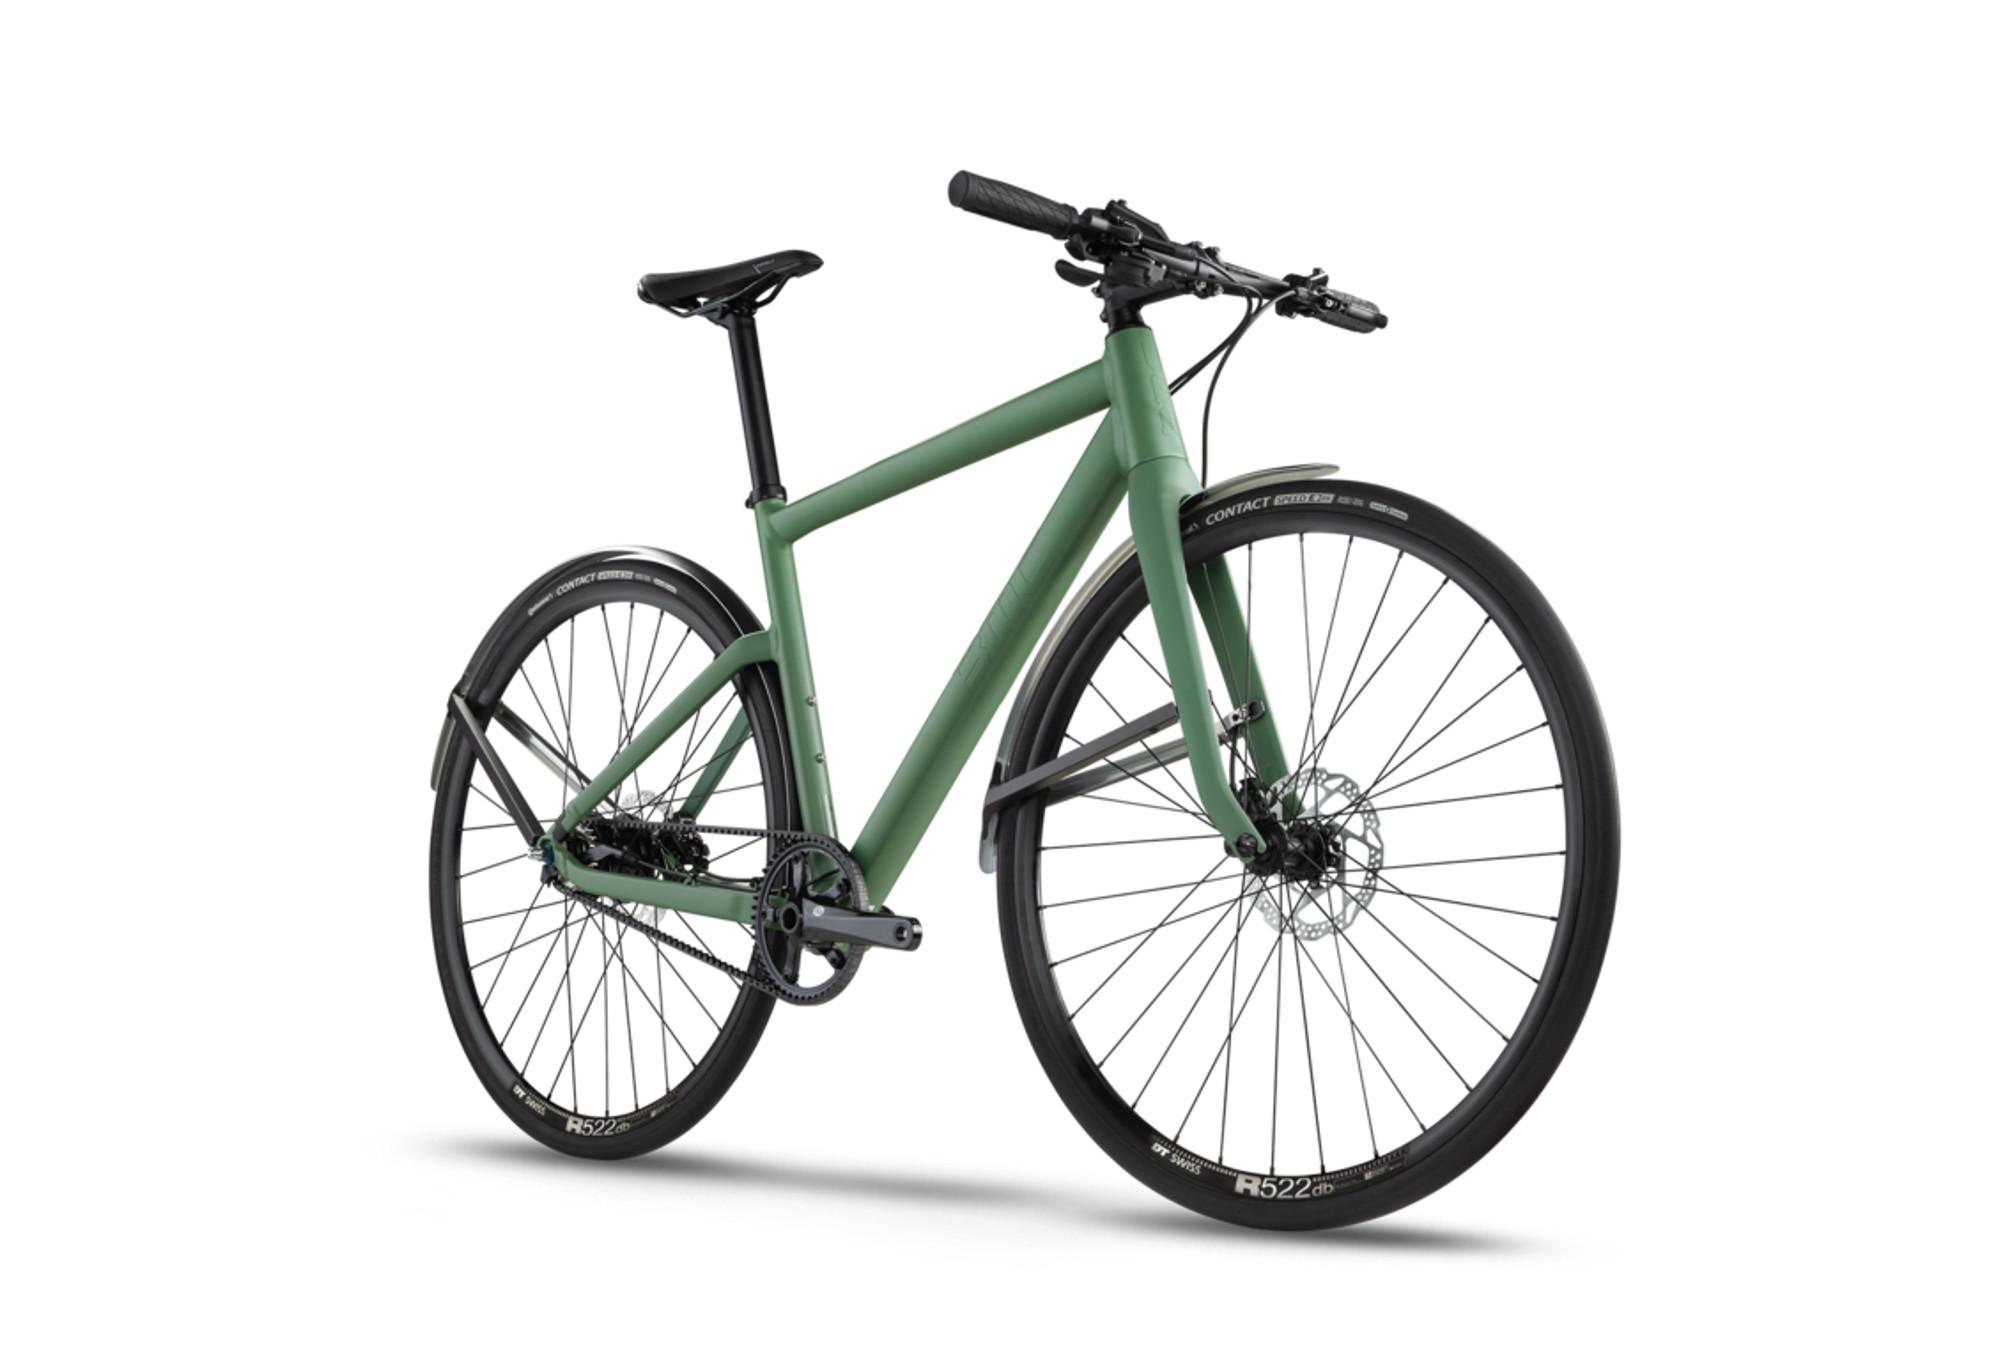 bmc 2019 alpenchallenge 01 one urban bike shimano alfine. Black Bedroom Furniture Sets. Home Design Ideas